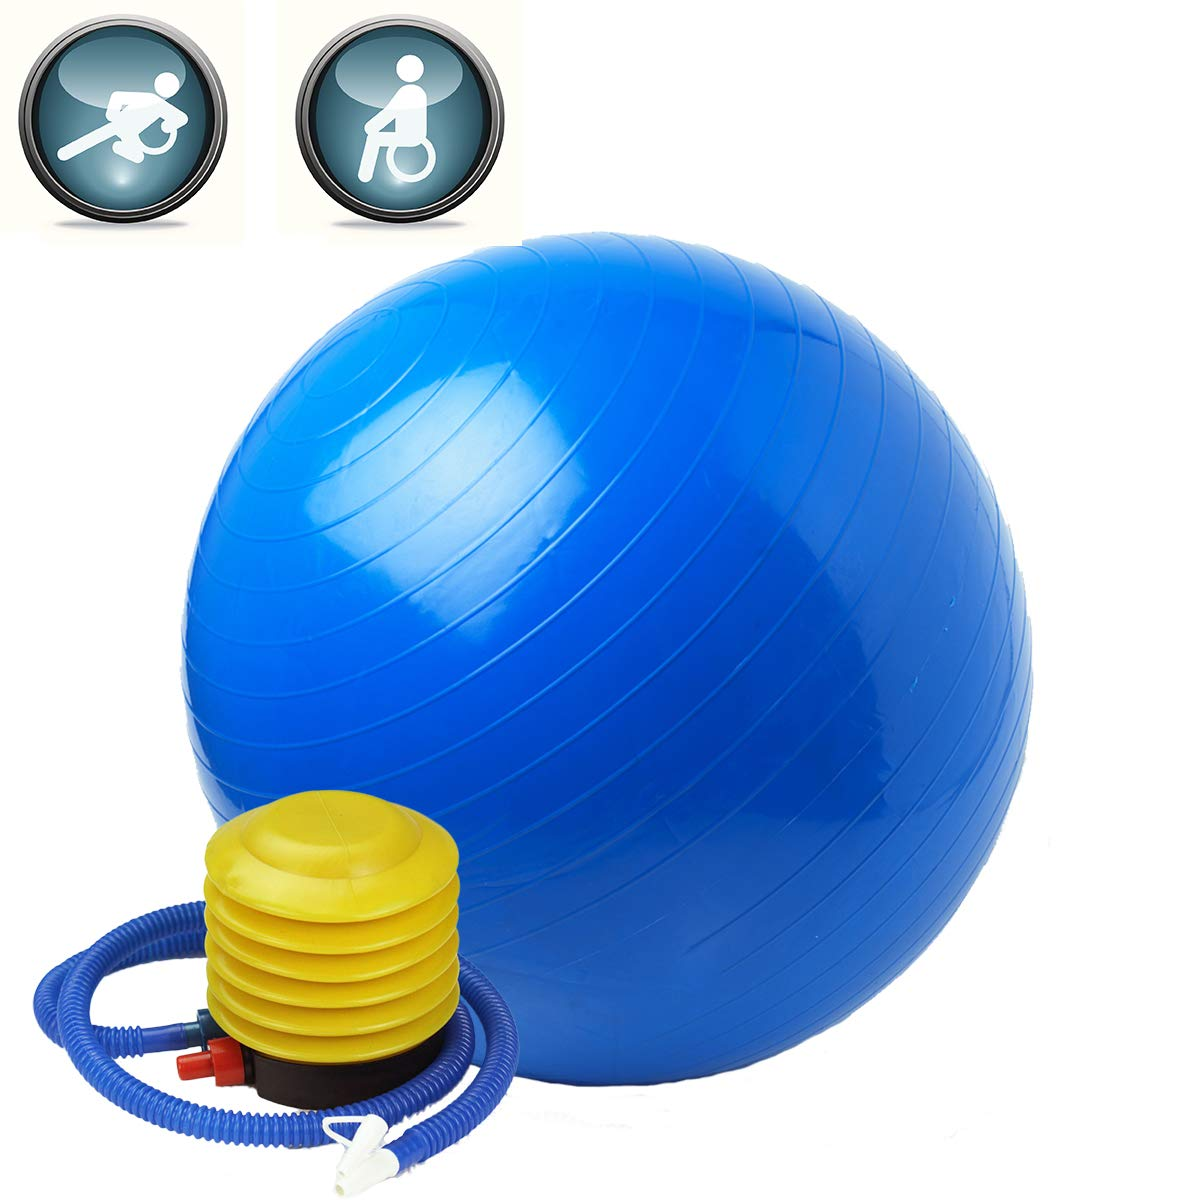 Fitness Ball Stability Anti-Burst 2200lb Capacity with Quick Pump - 65cm Yoga Ball,Exercise Ball,Stability Ball,Balance Ball,Pilates Ball